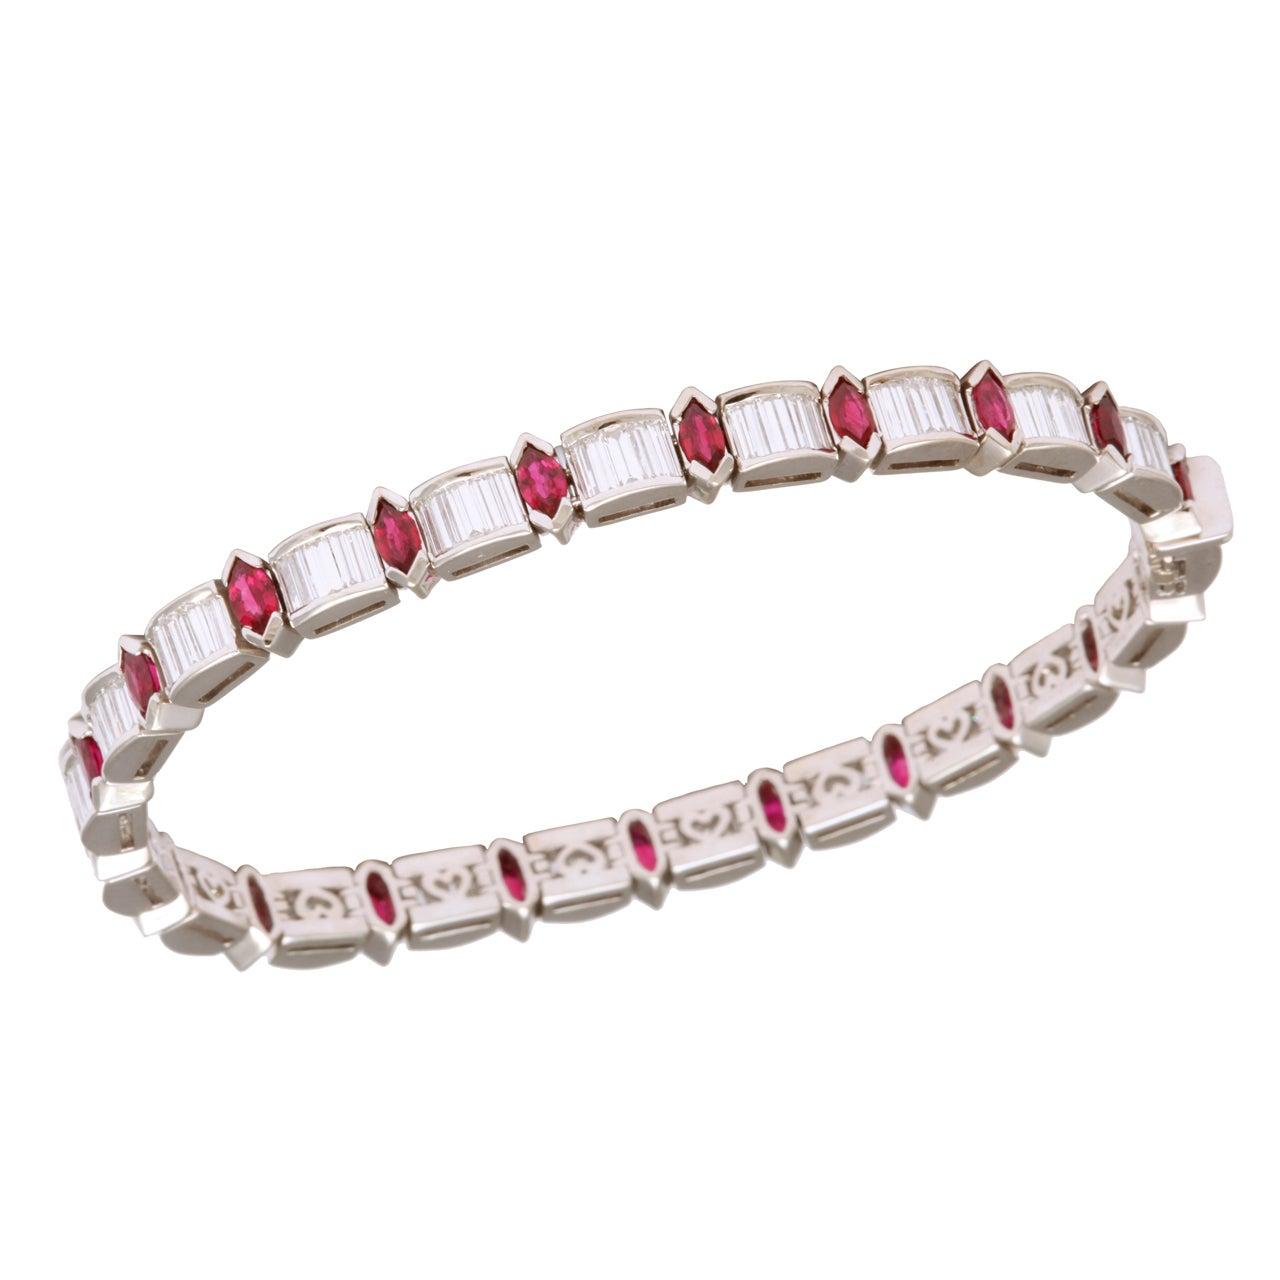 kurt wayne ruby bracelet at 1stdibs